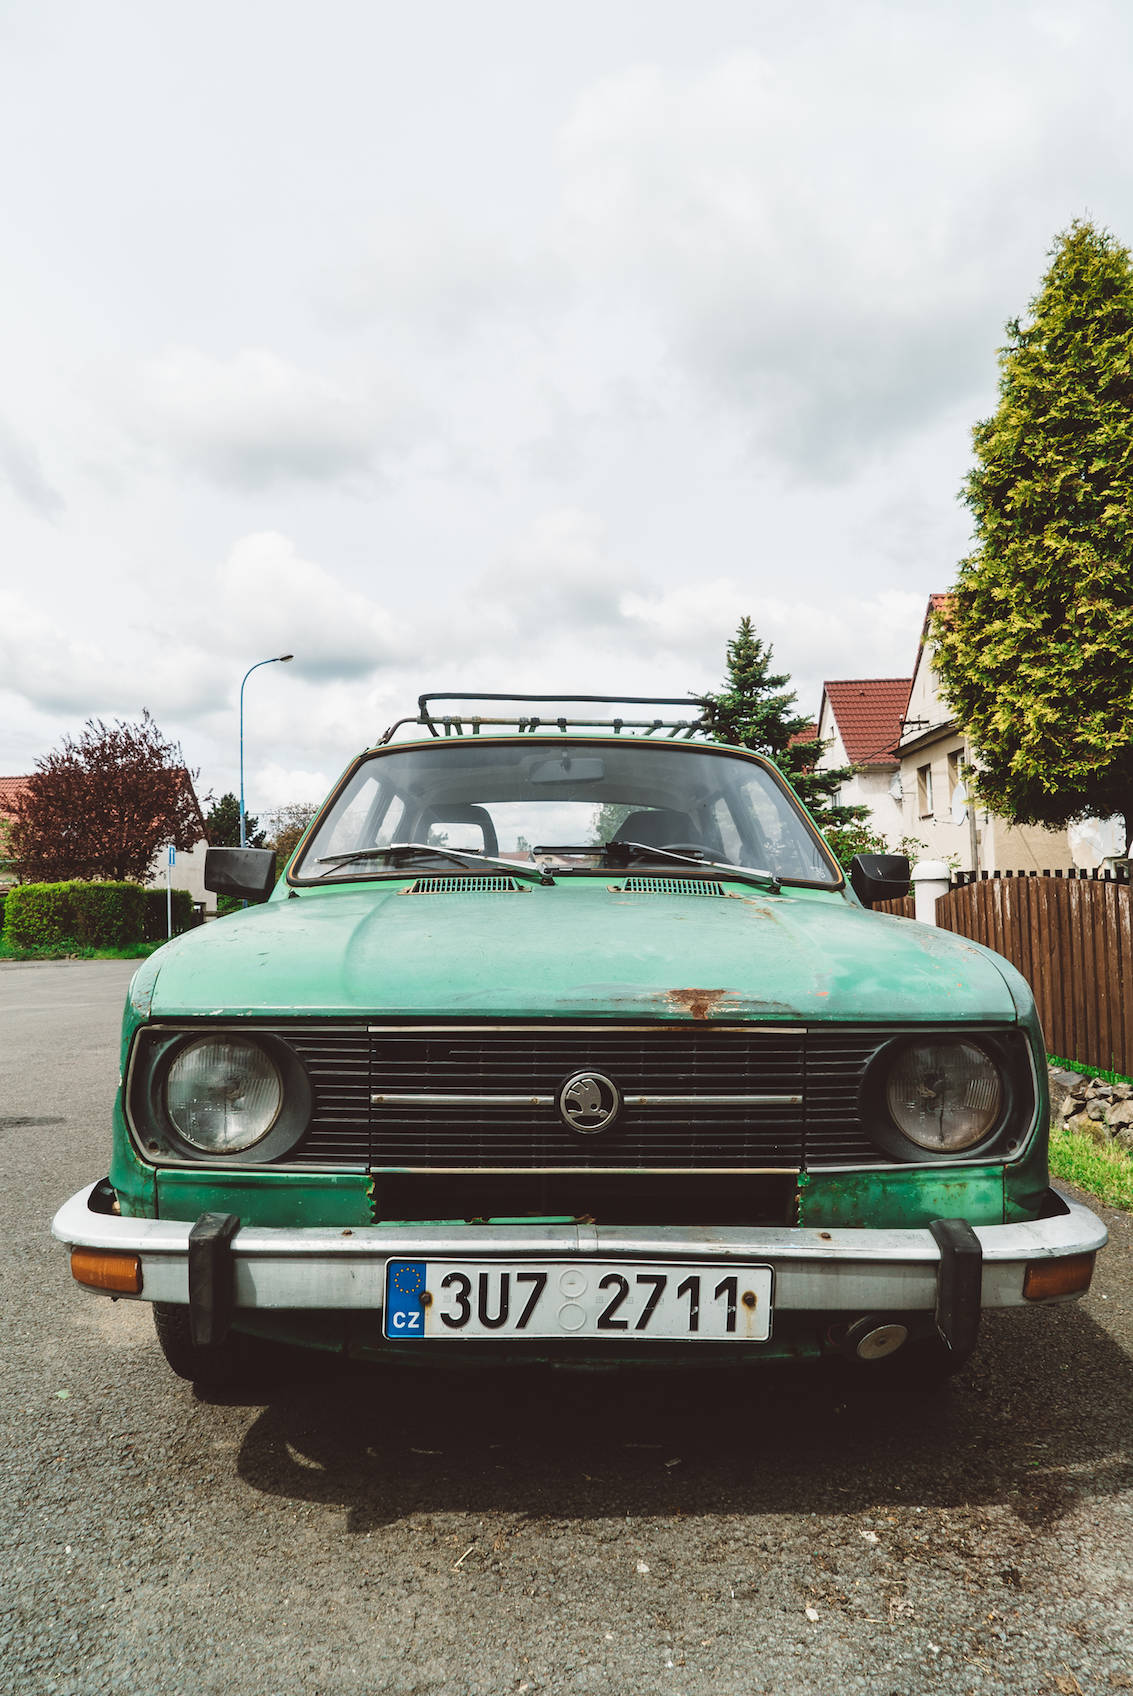 Czech Car from the 70s